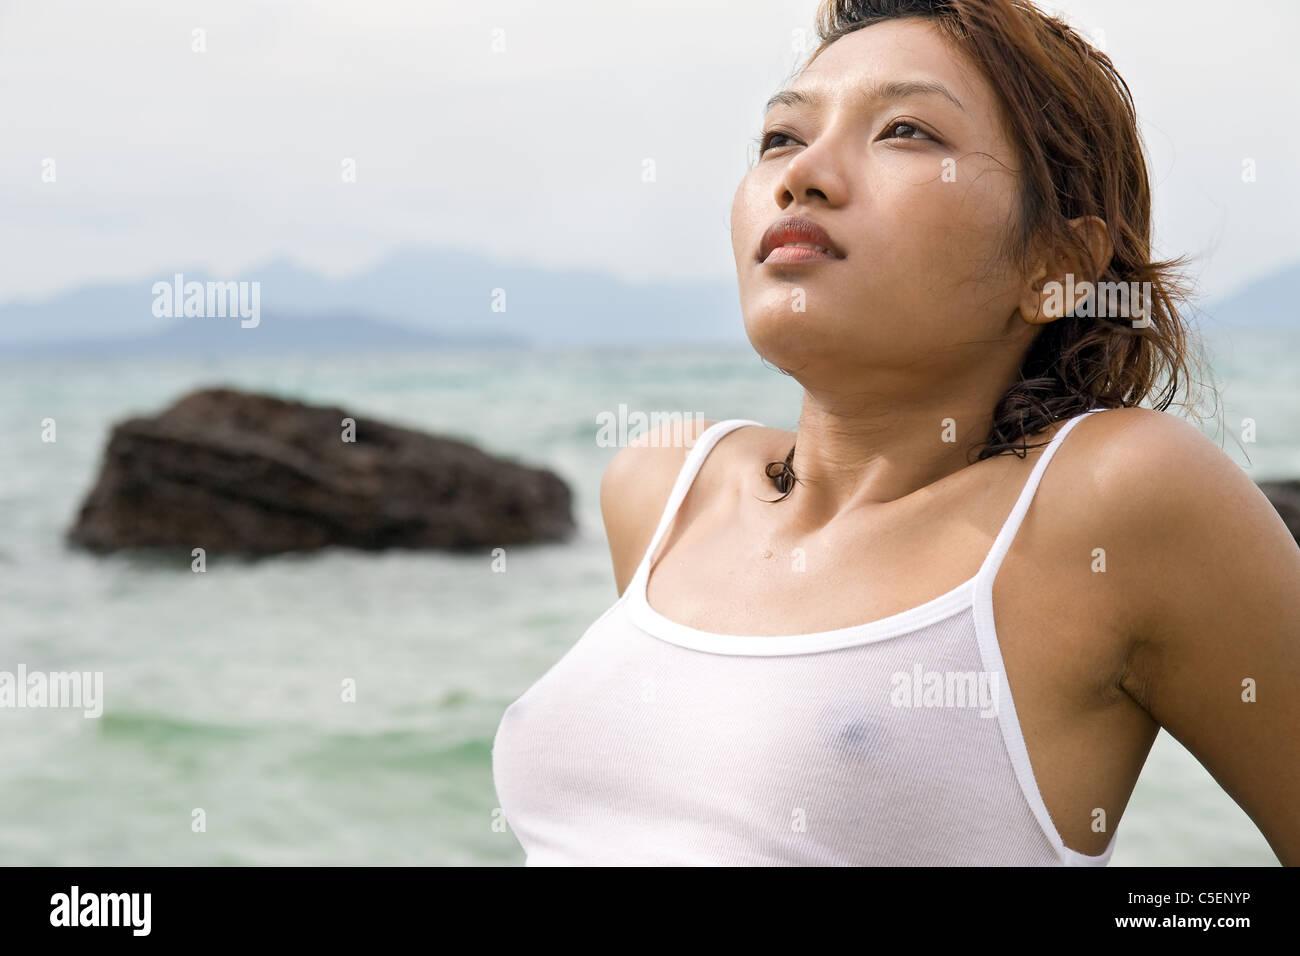 Girls In Wet Shirts